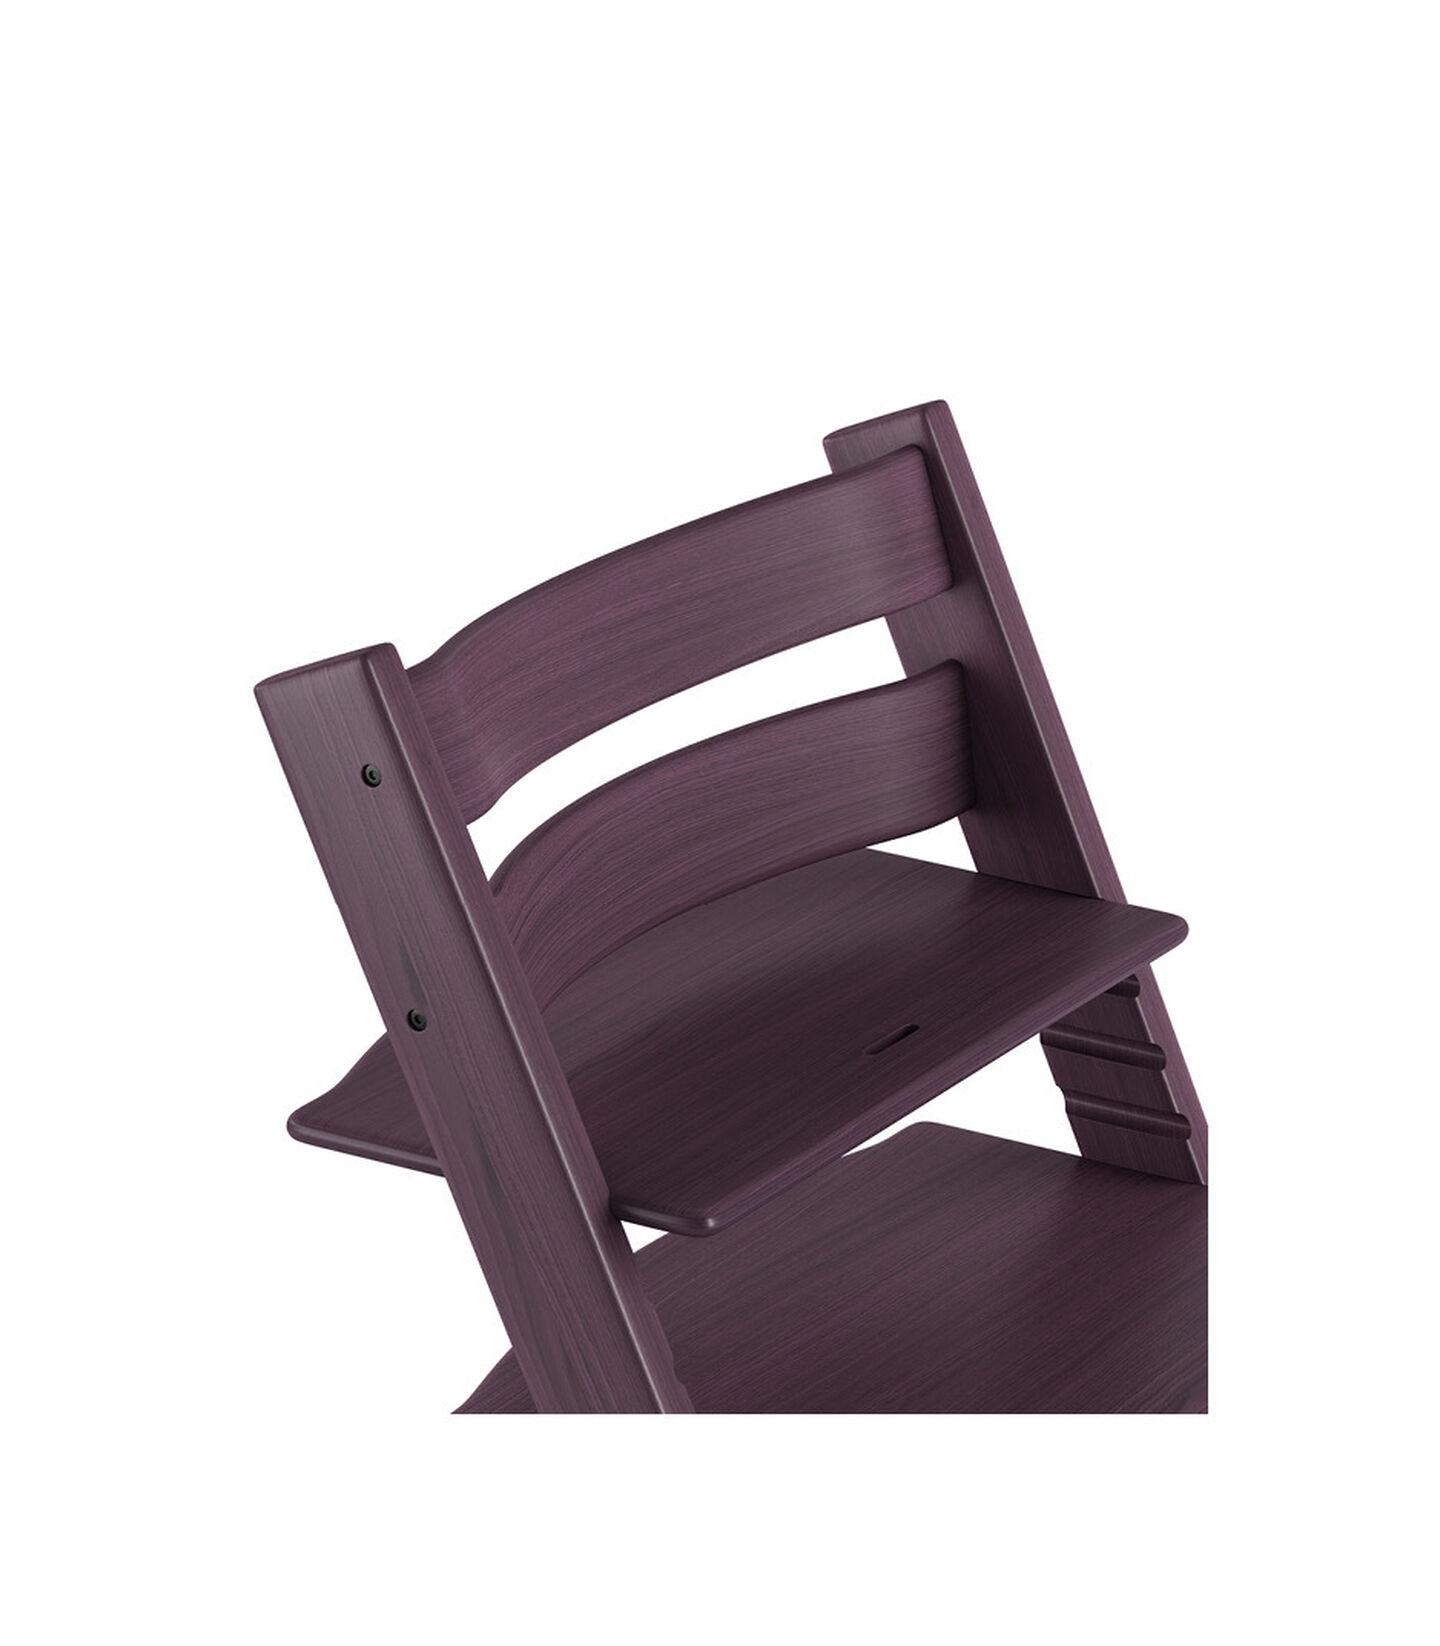 Tripp Trapp® Chair close up 3D rendering Plum Purple